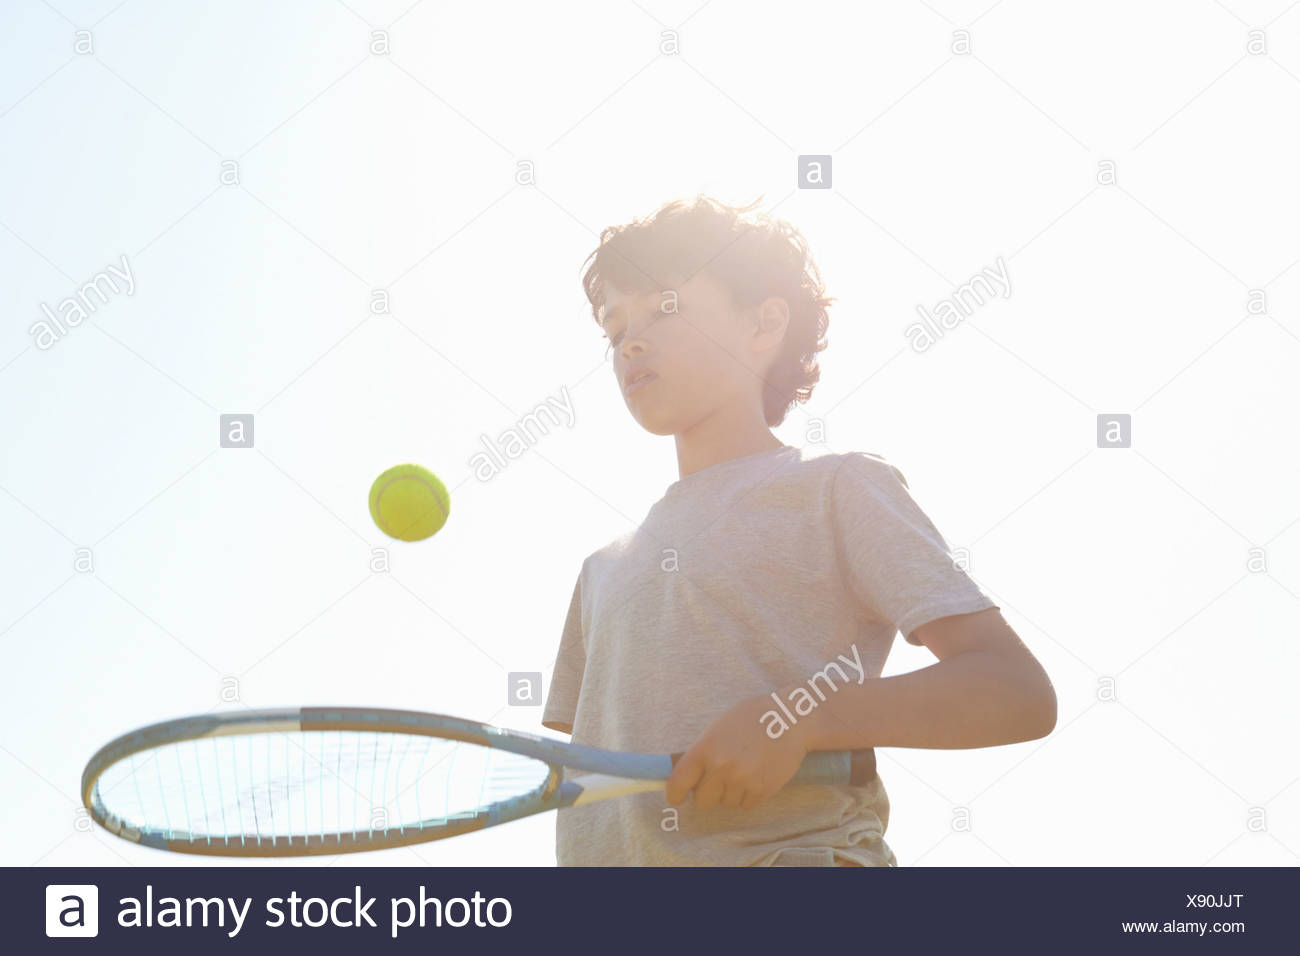 Garçon balle rebondissante sur raquette de tennis Photo Stock